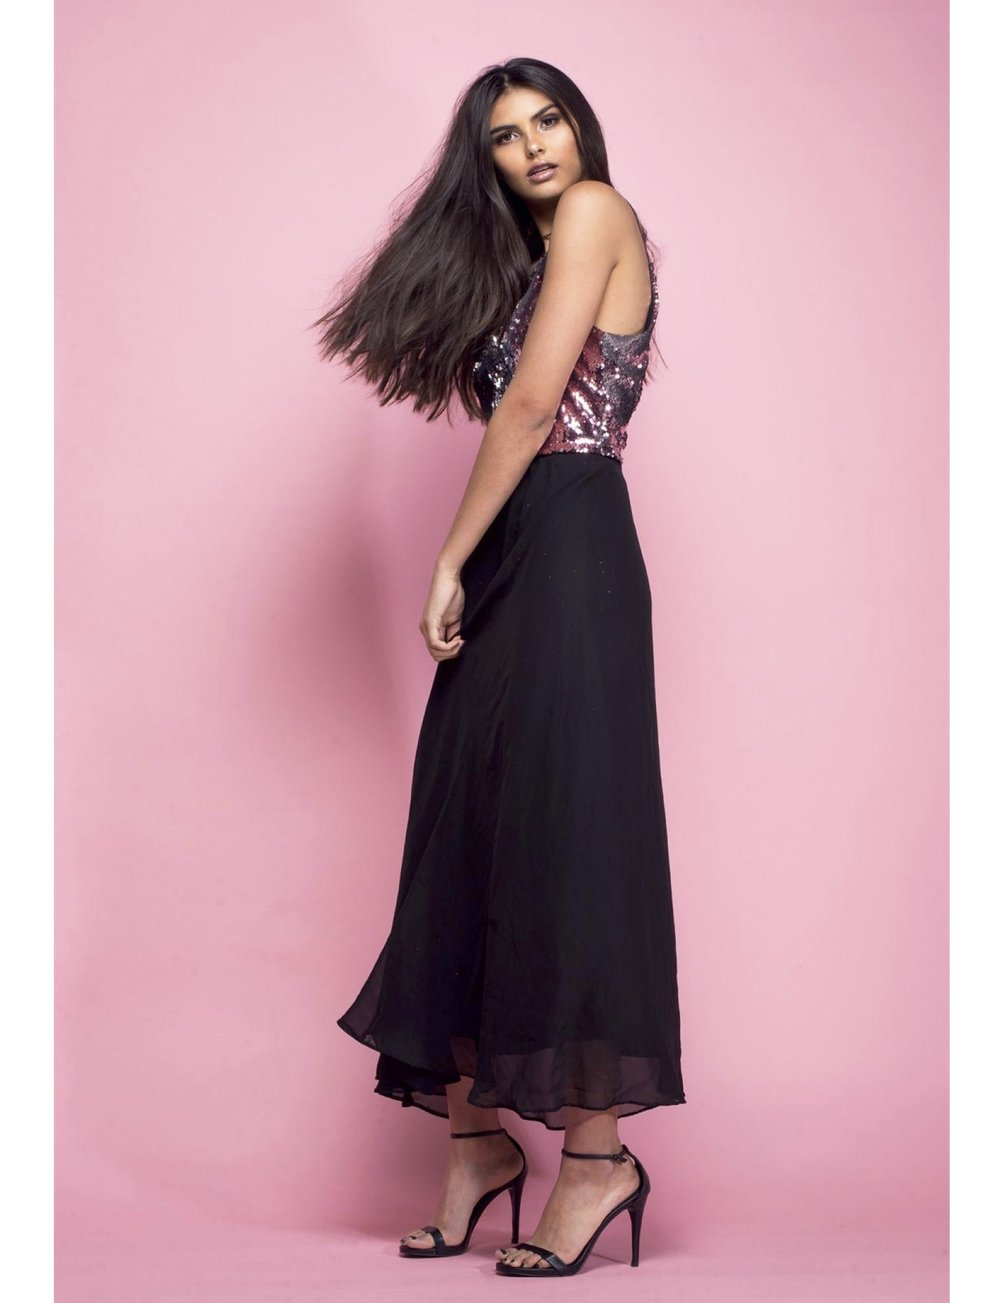 """All That Glitters"" published in Surreal Beauty Magazine  Model: Maya Elliott  Agencies: IMG Worldwide, Ursula Wiedmann Models  Makeup & Hair: Jessica Rochelle  Stylist: Joy Hollywood  Assistant: Alvin Powell"